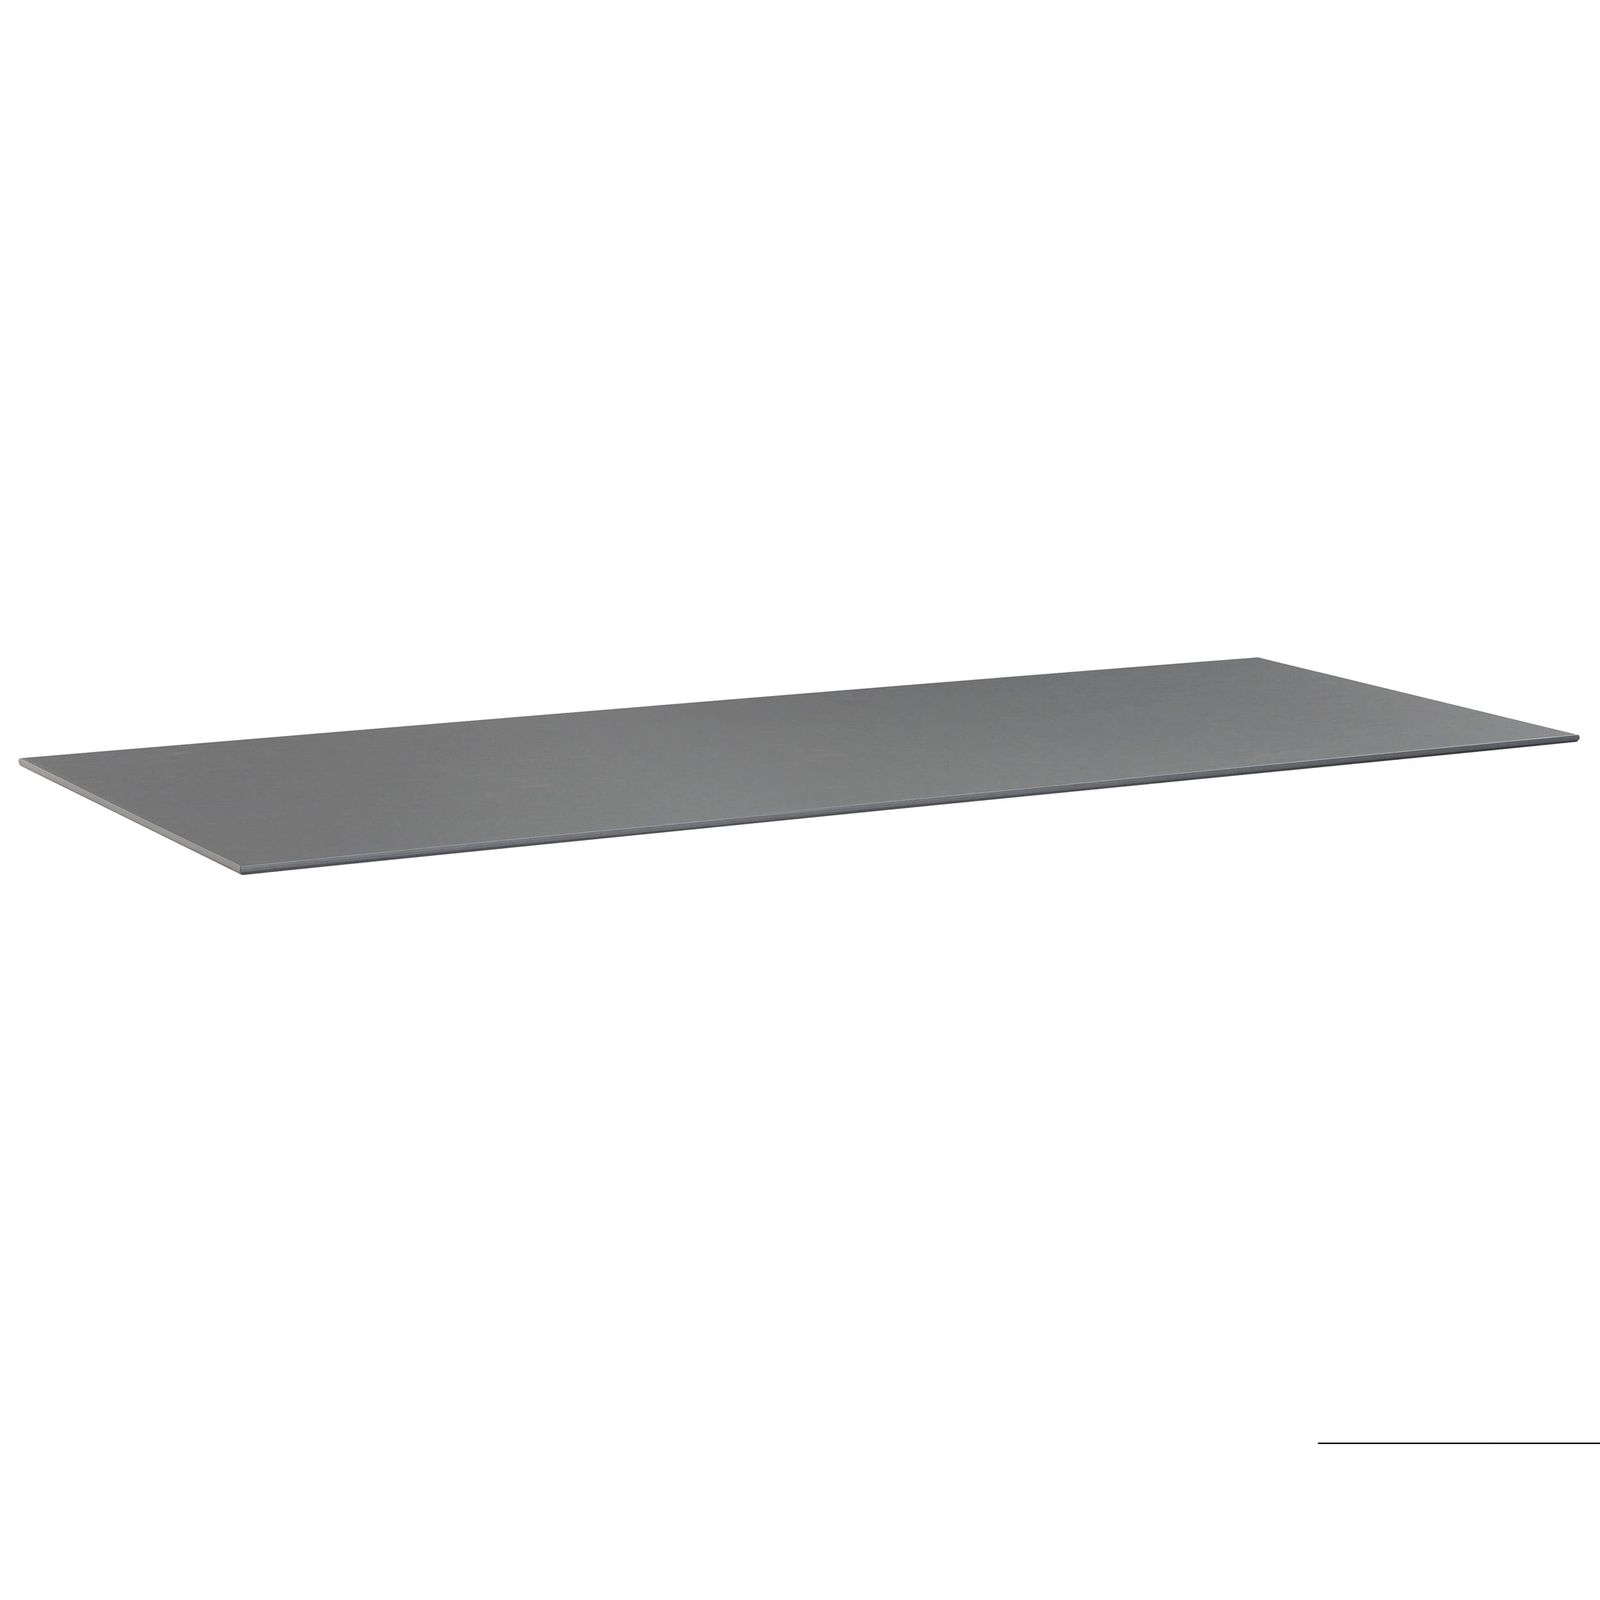 Blat stołu Kettalux Plus 220 x 95 cm szary KETTLER